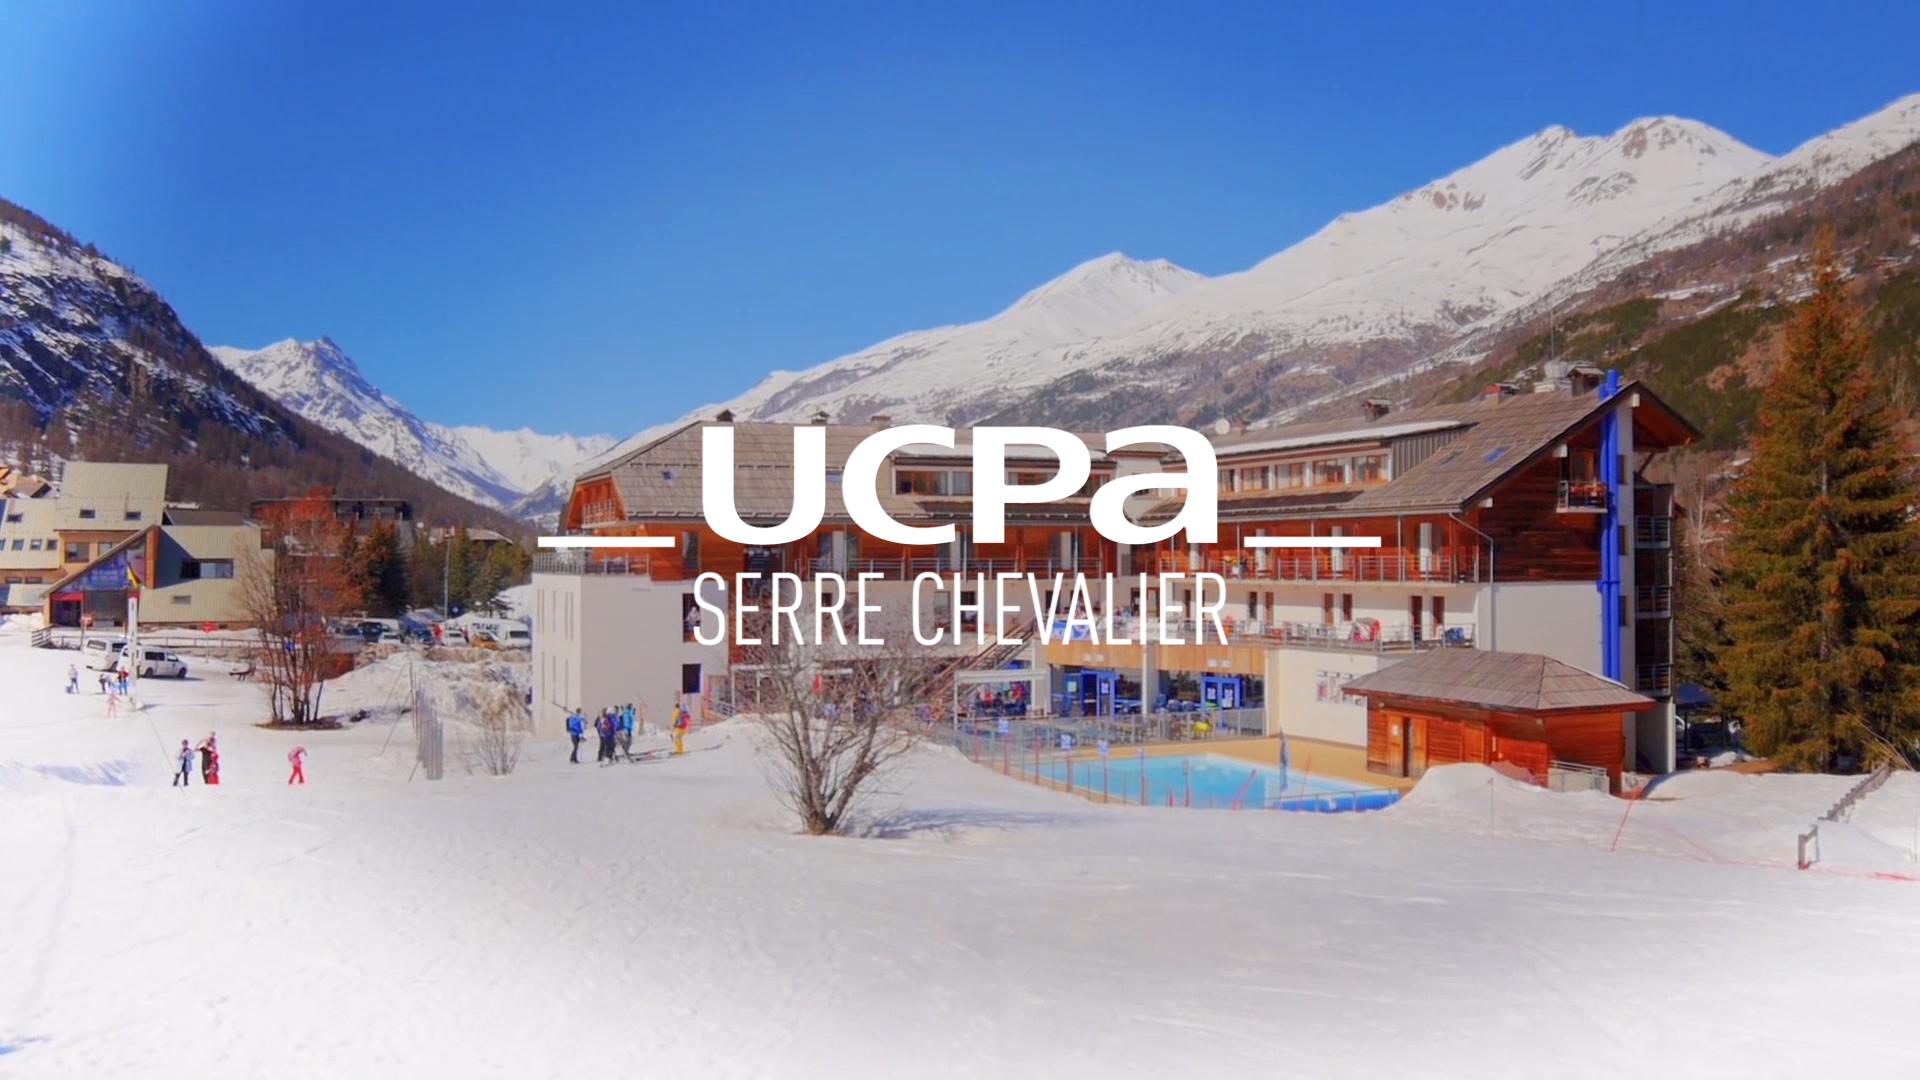 UCPA Serre Chevalier